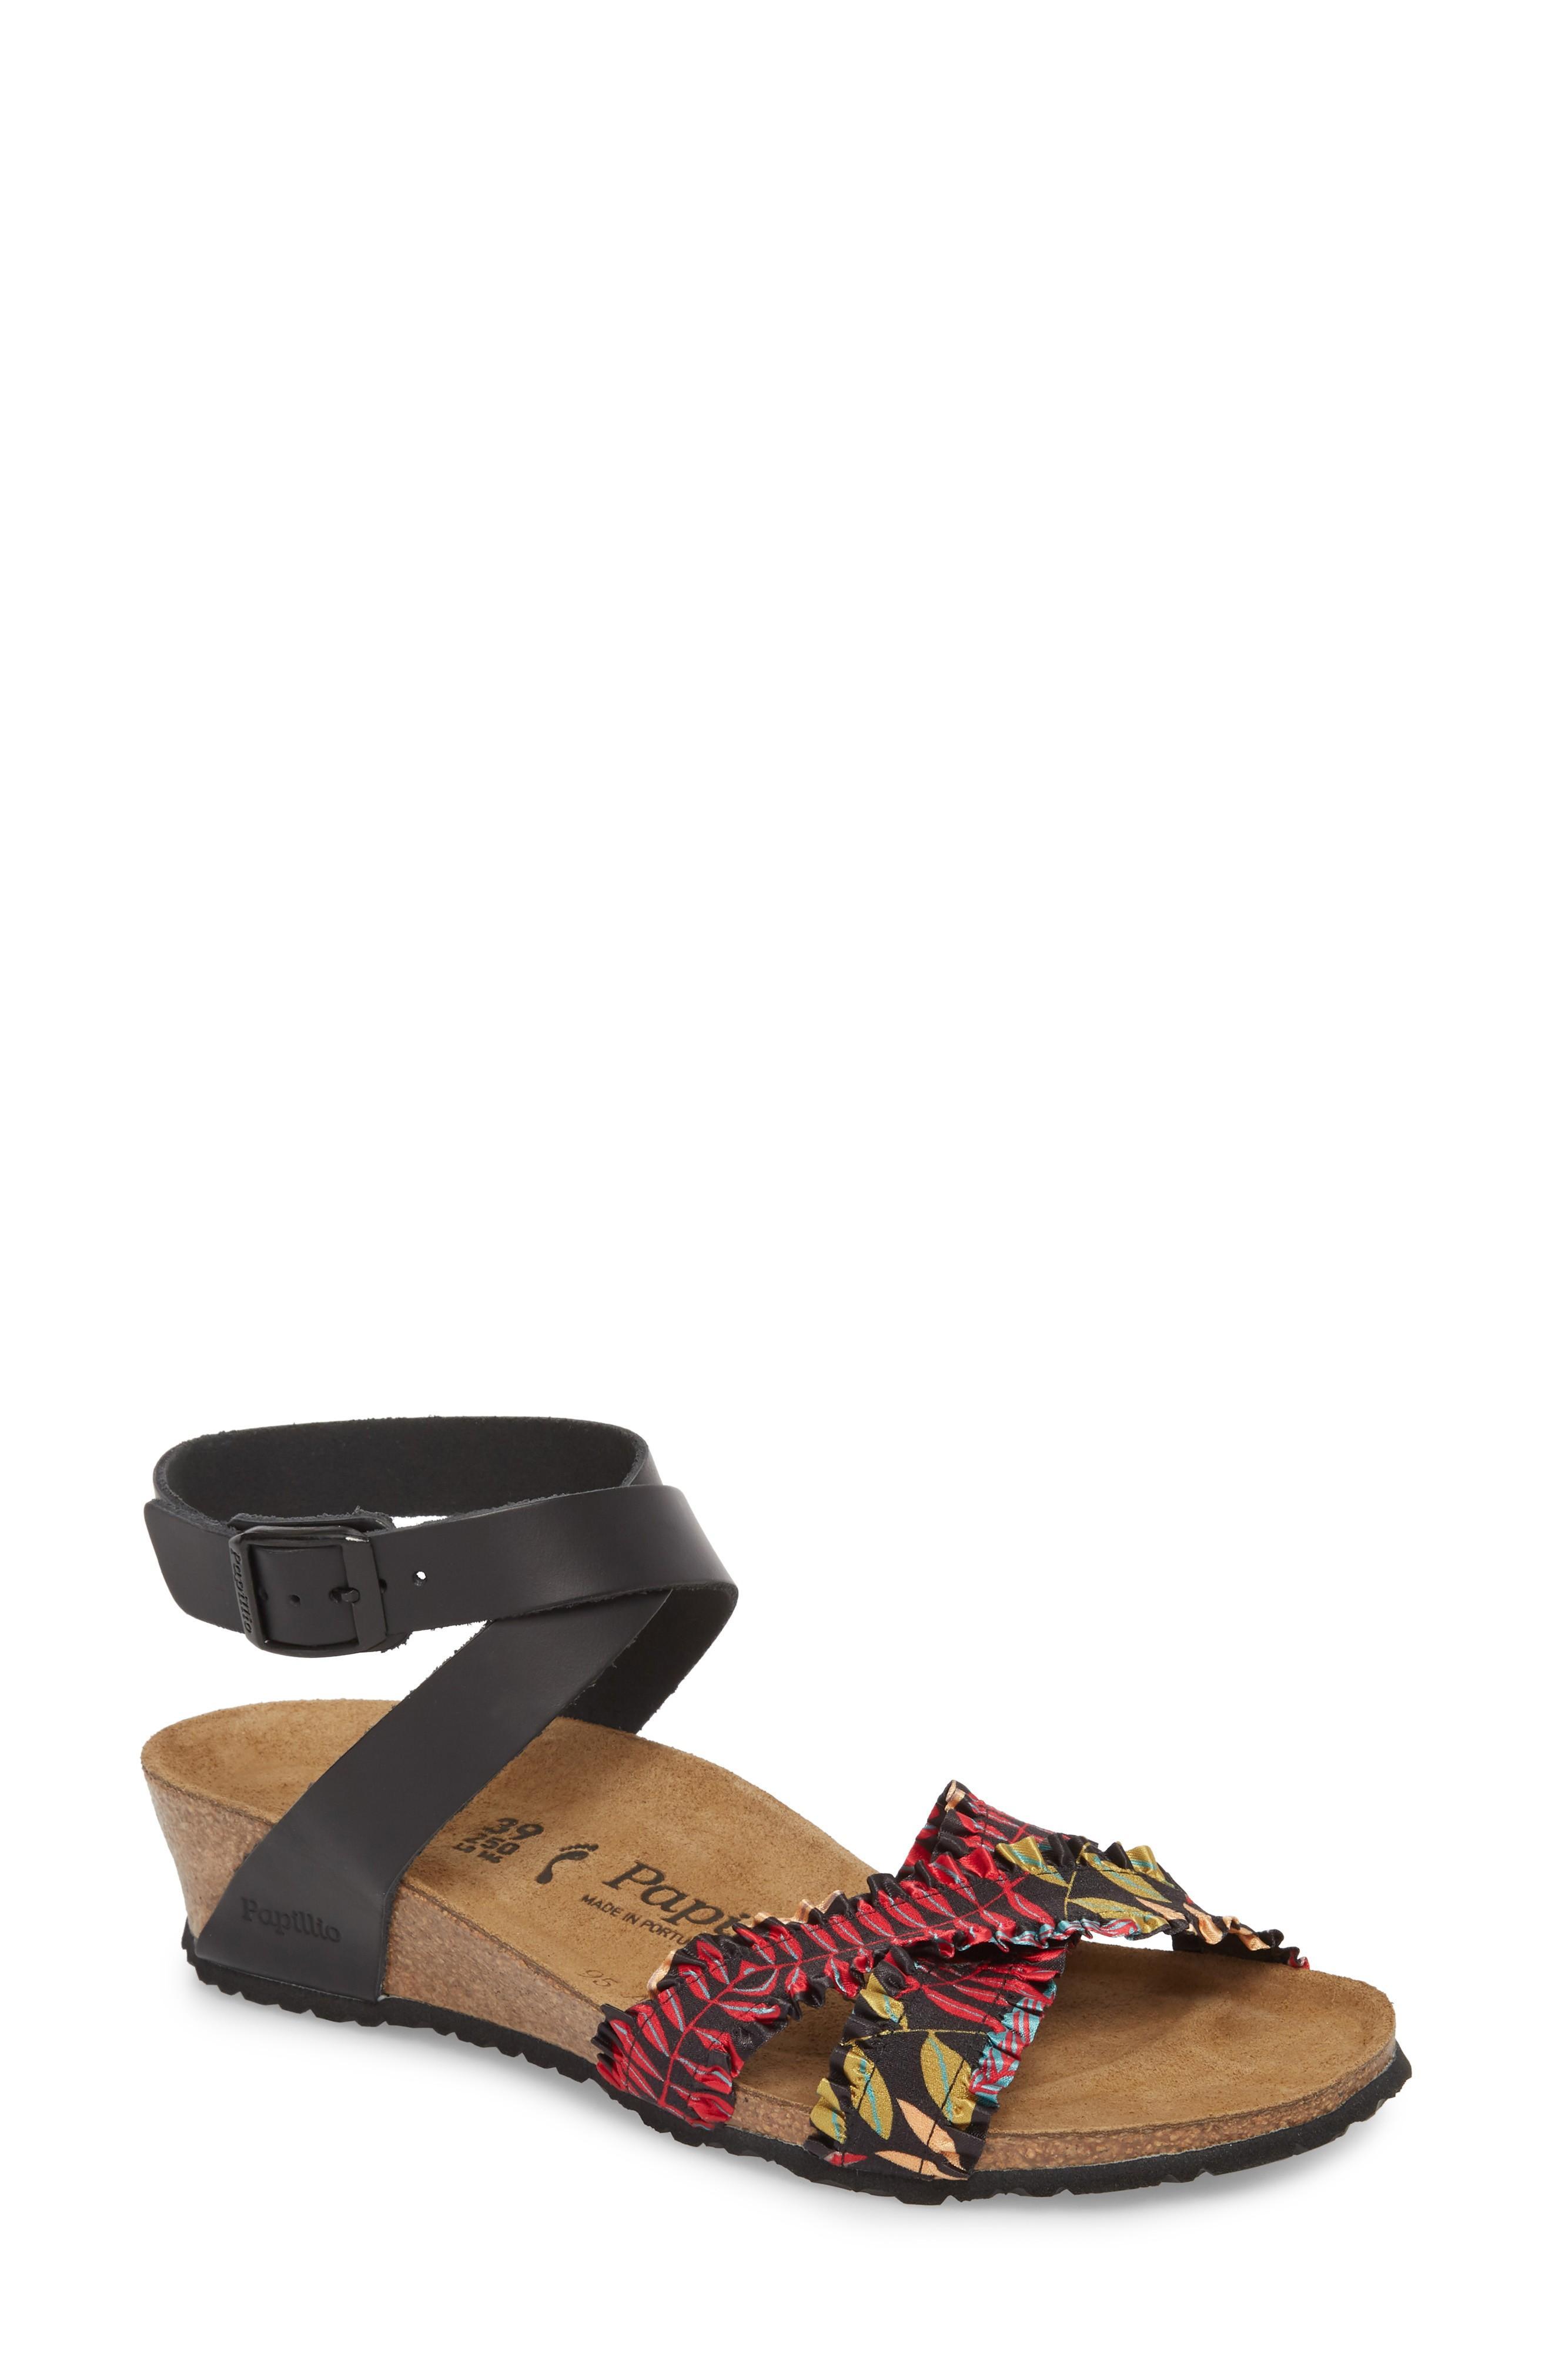 7f69ddf6d08 Birkenstock Lola Wedge Sandal In Flower Frill Black Fabric